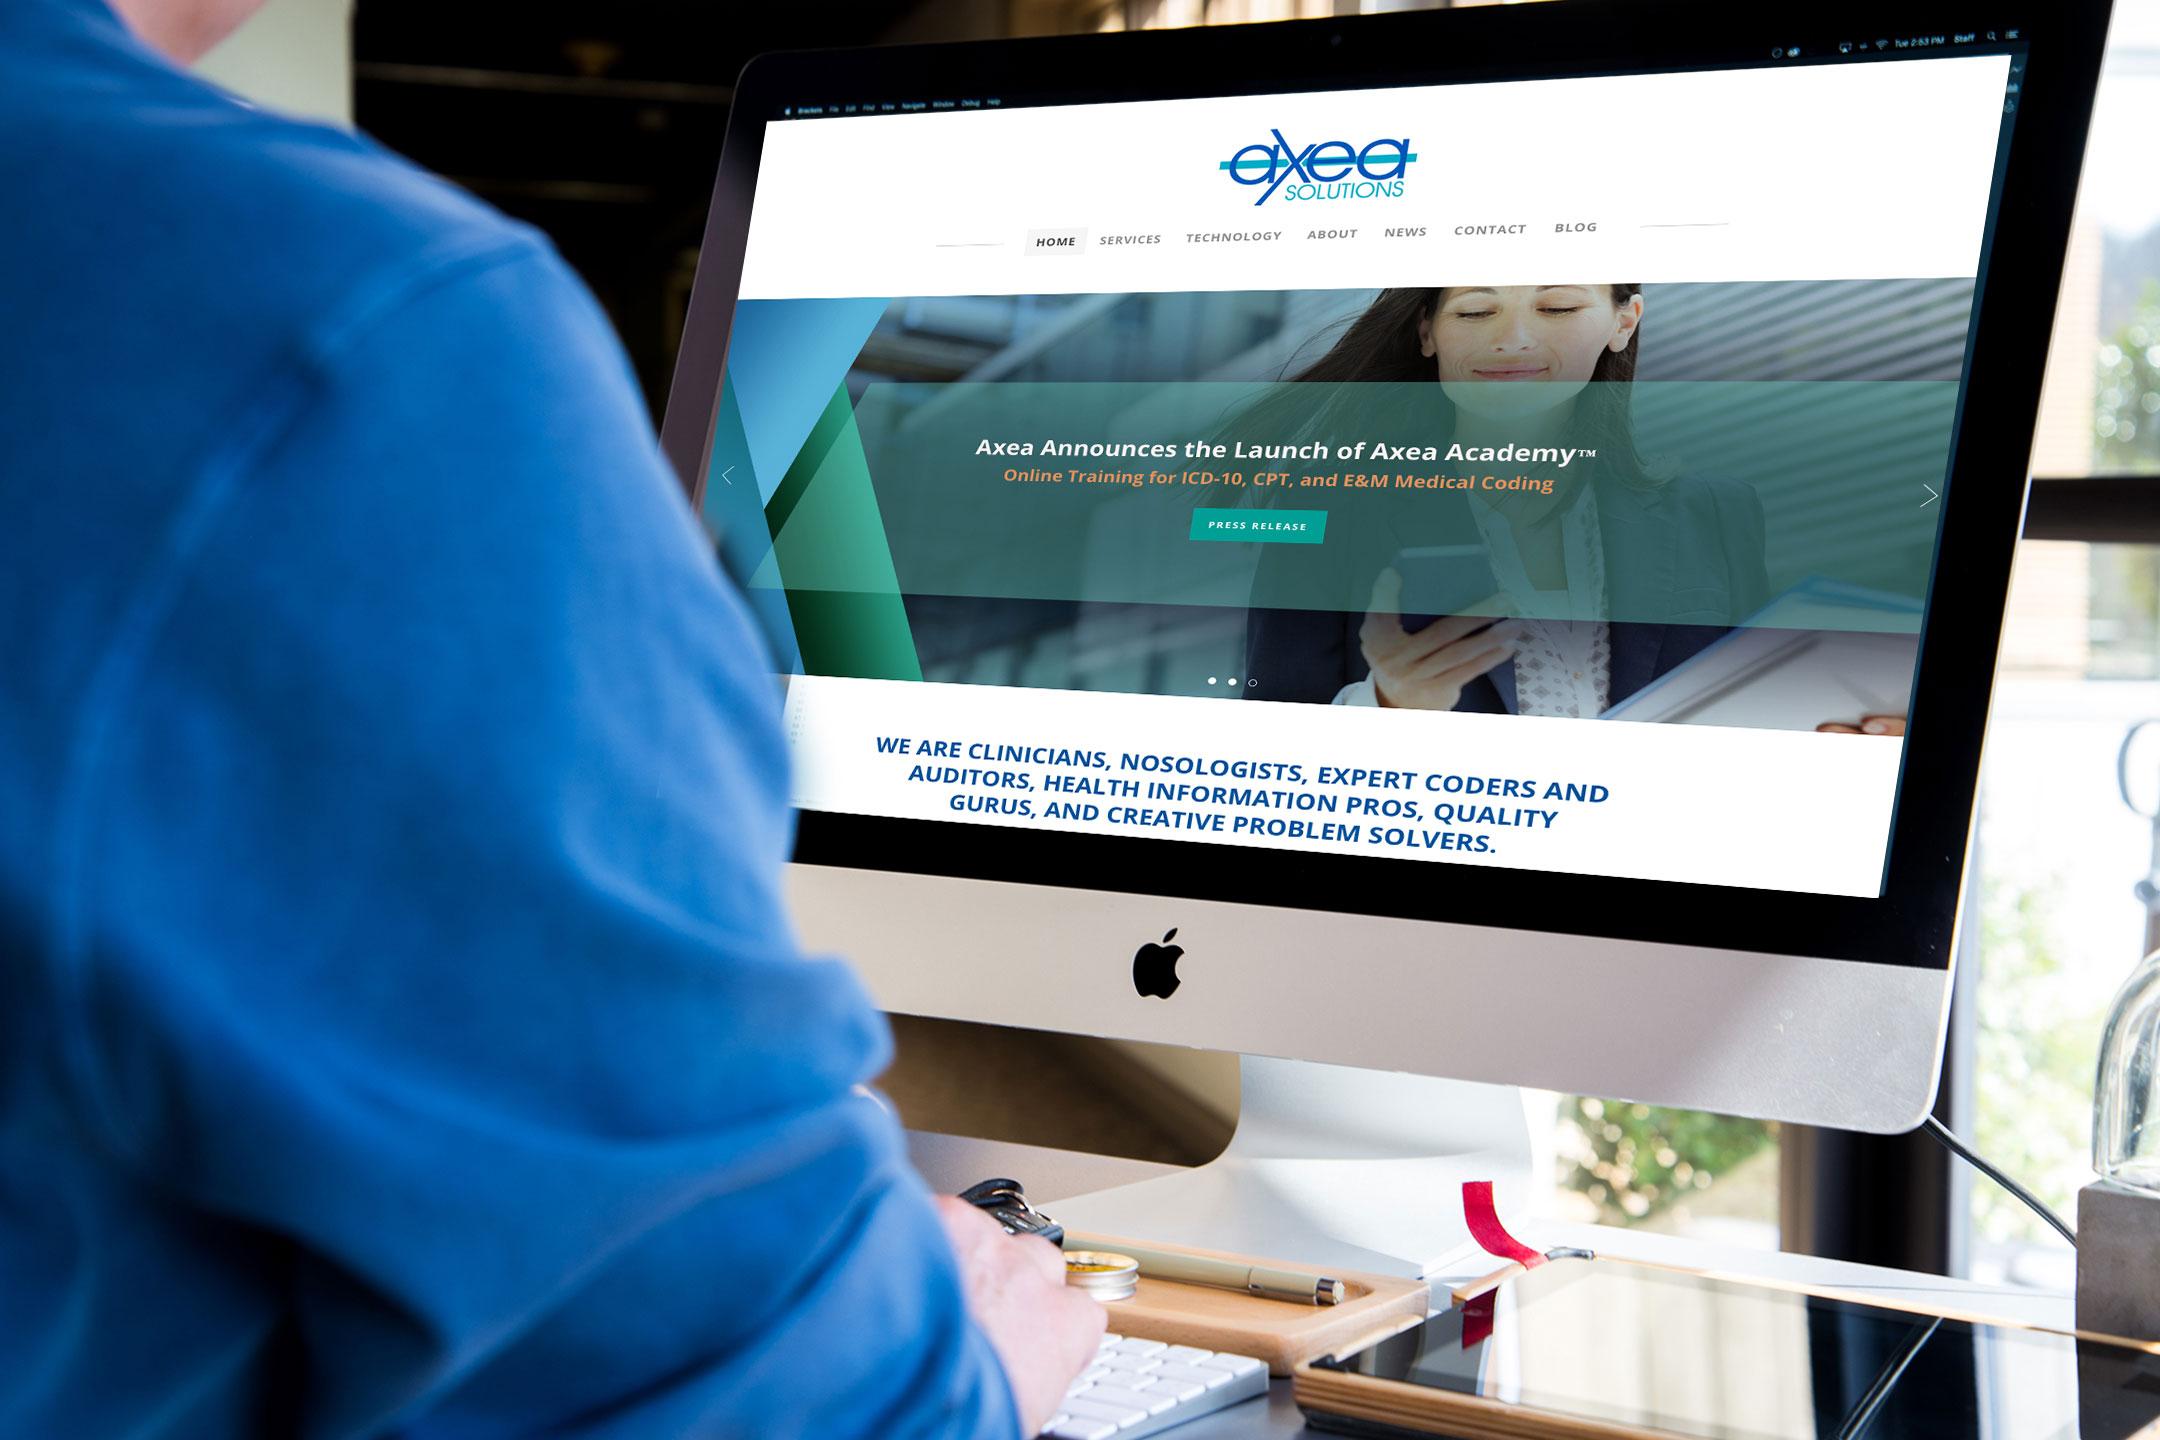 8-Axea-Solutions_web.jpg